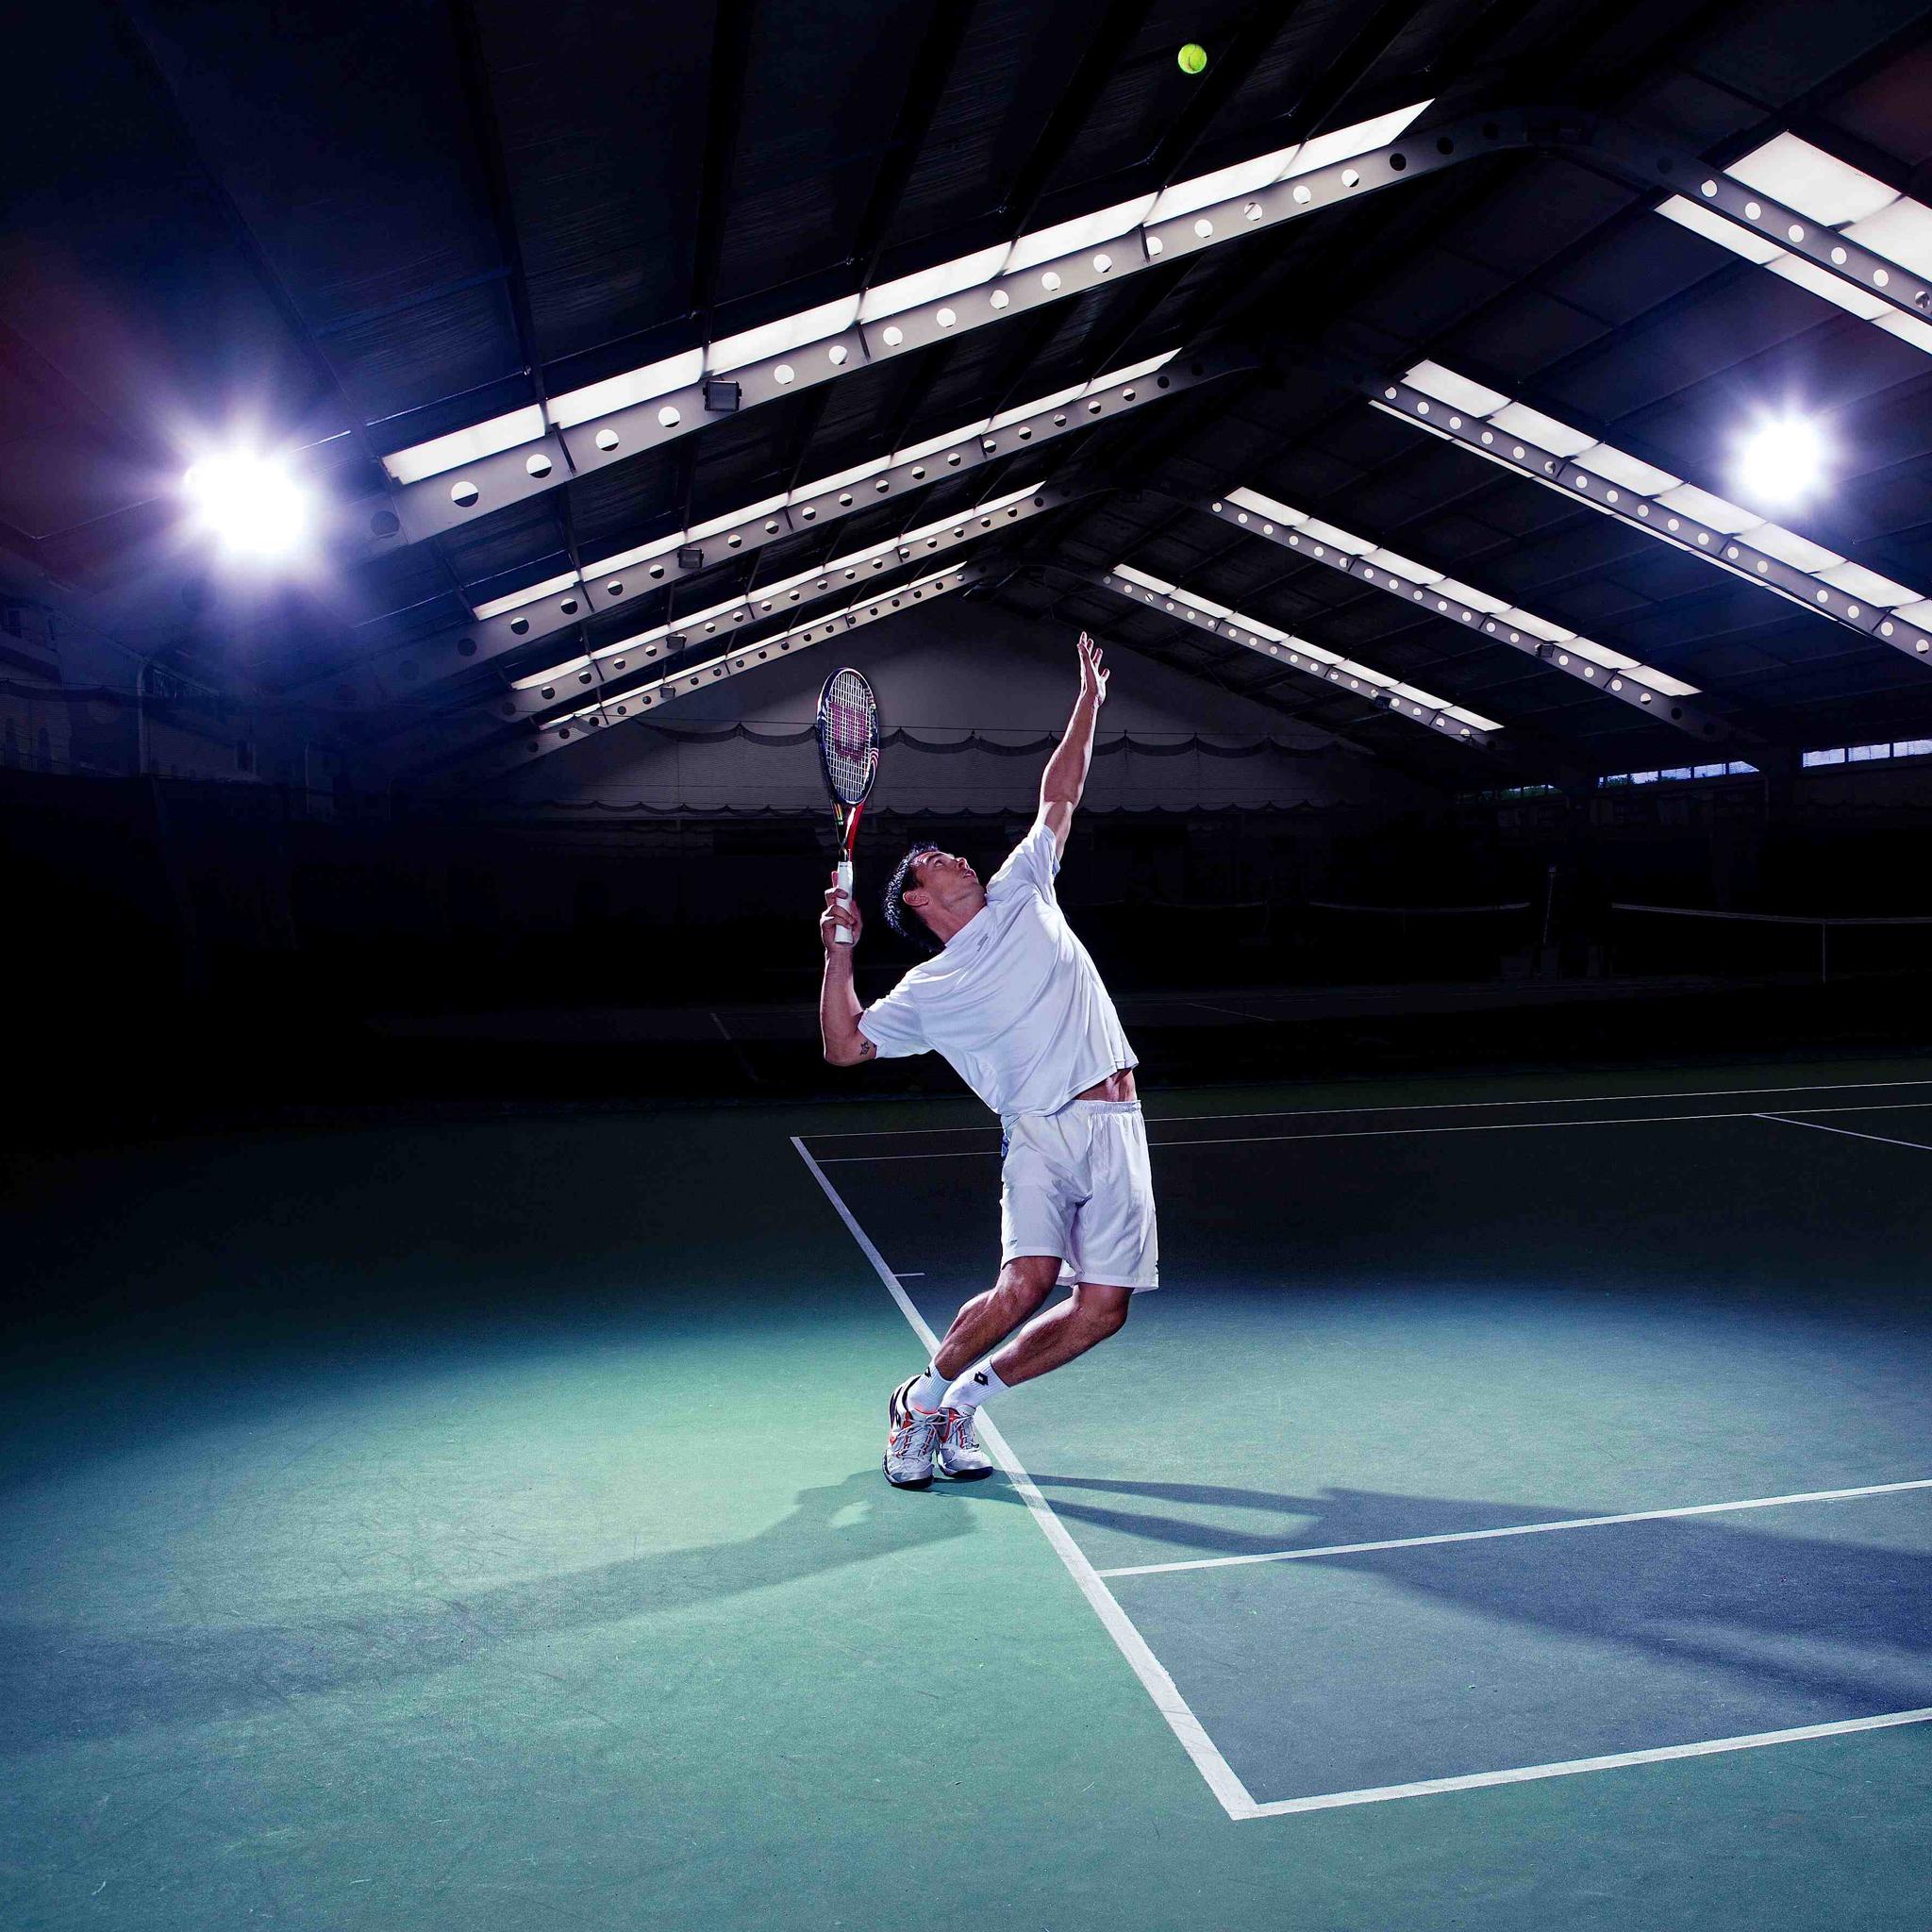 Tennis-3Wallpapers-iPad-Retina